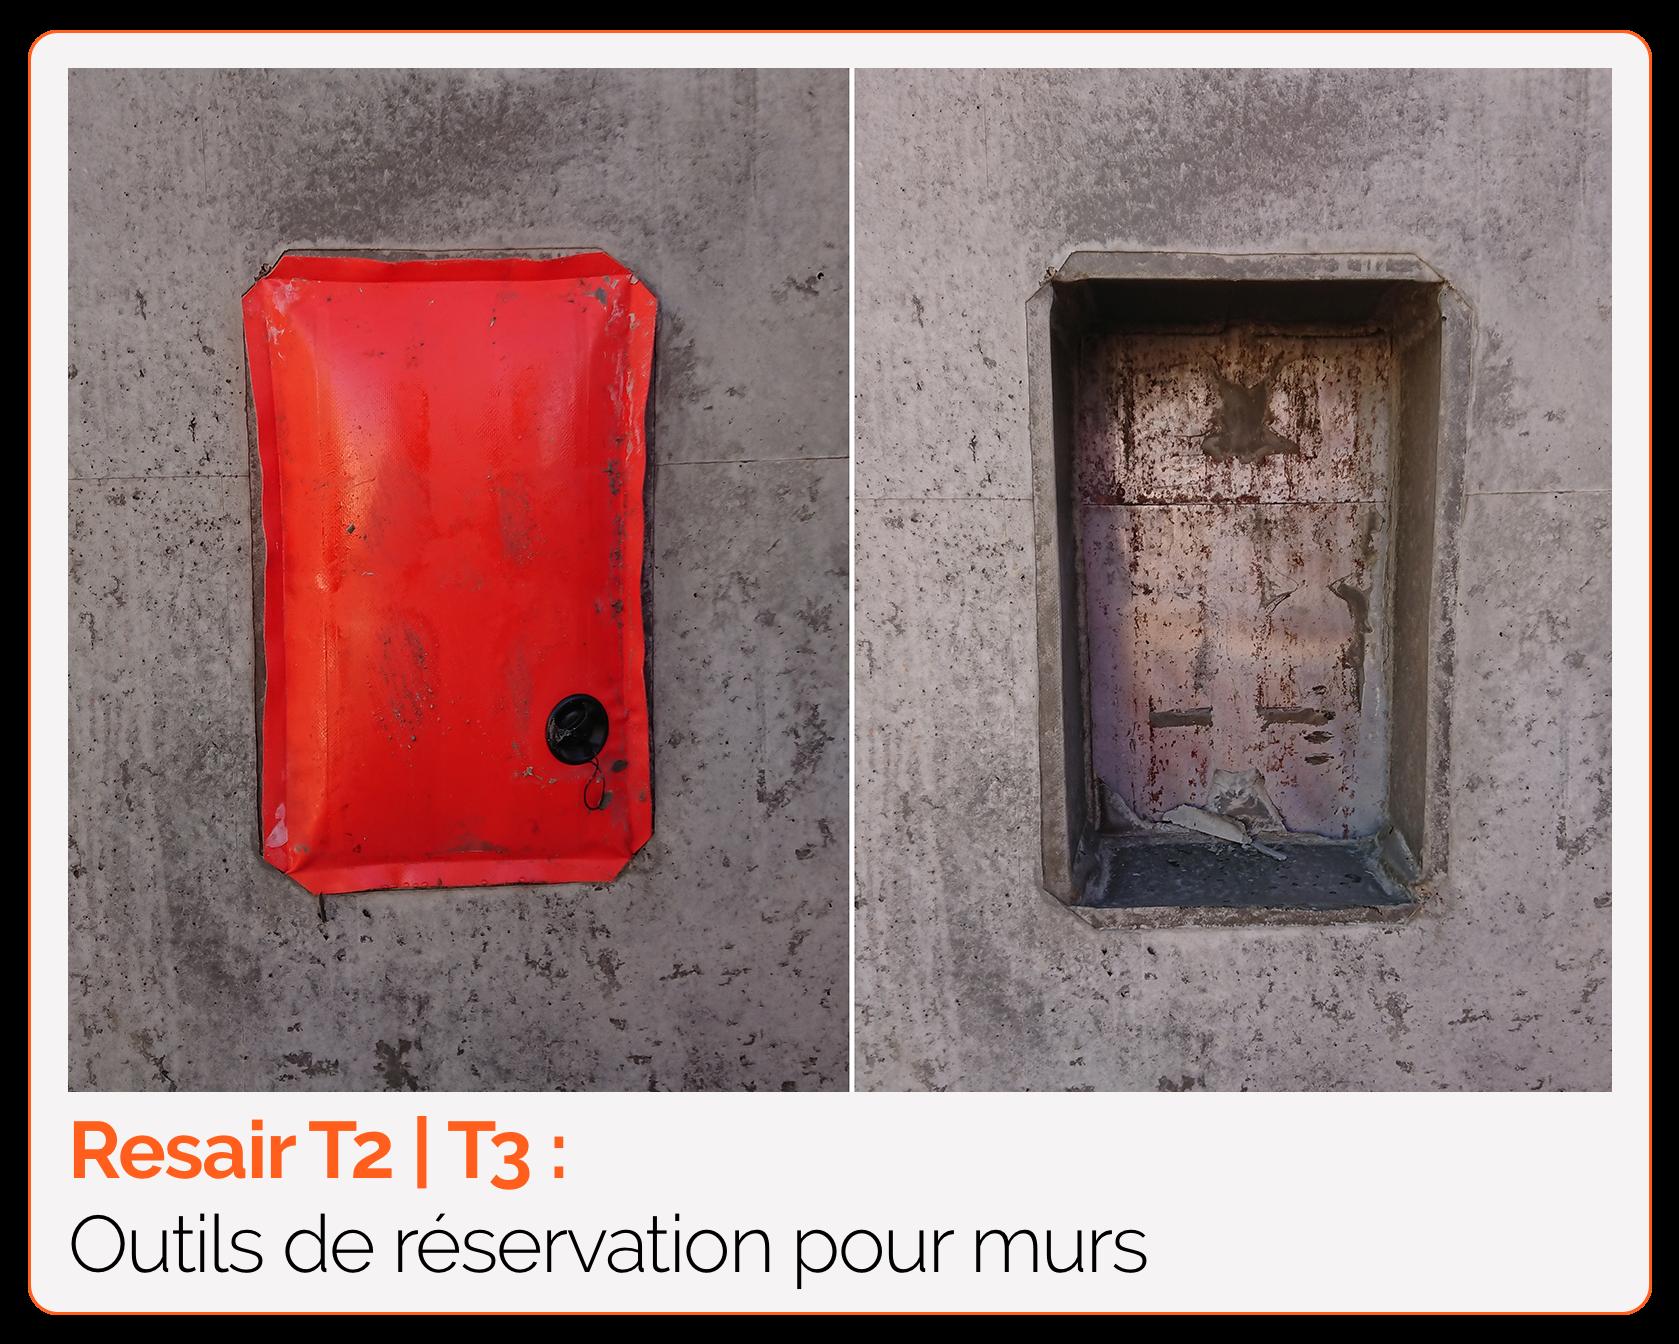 Resair T2 | T3 Choix